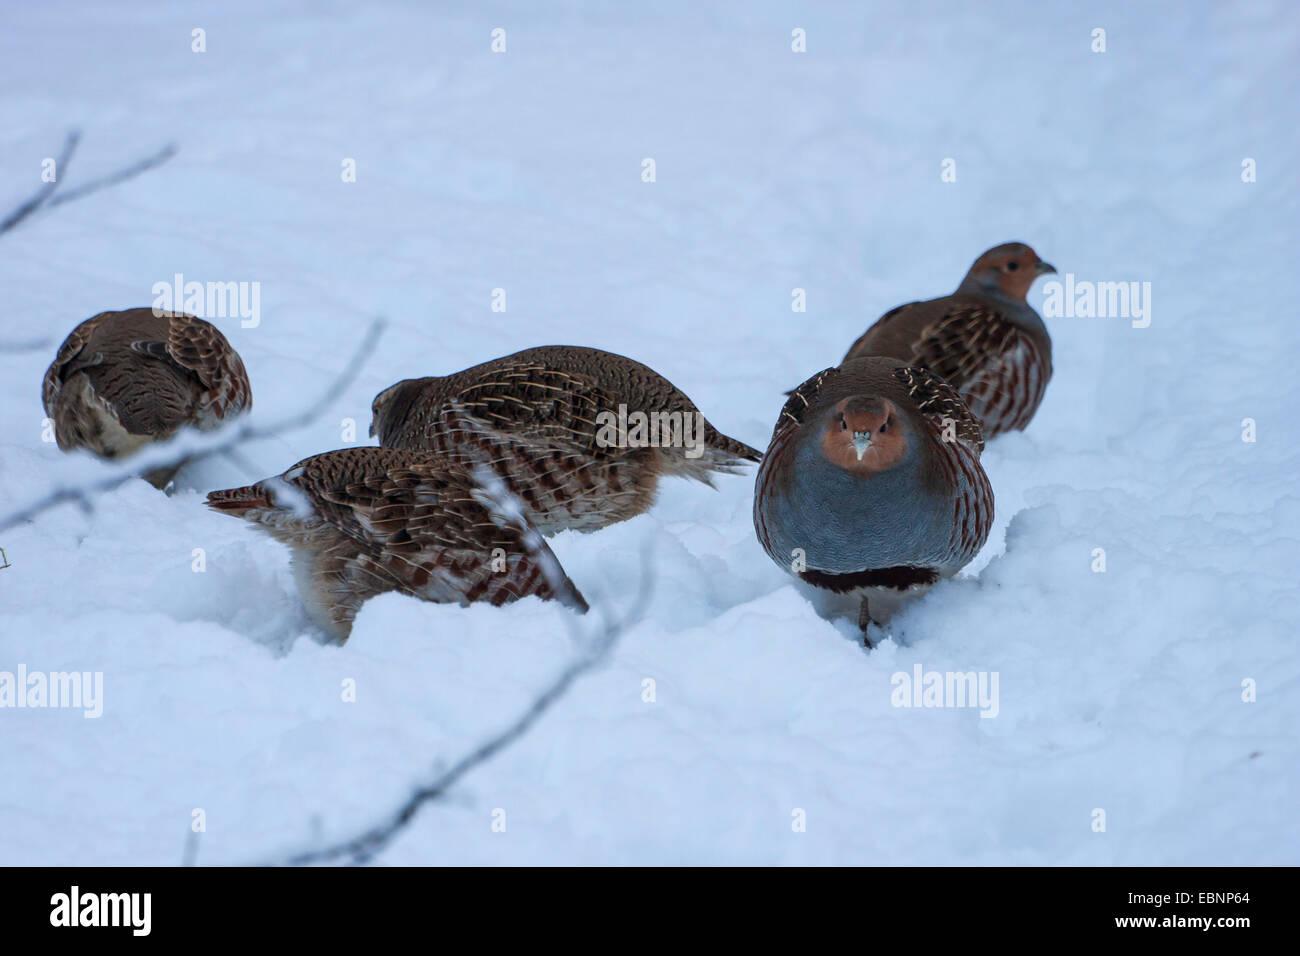 grey partridge (Perdix perdix), grey partridges on the feed in snow, Germany, Bavaria, Bavarian Forest National - Stock Image